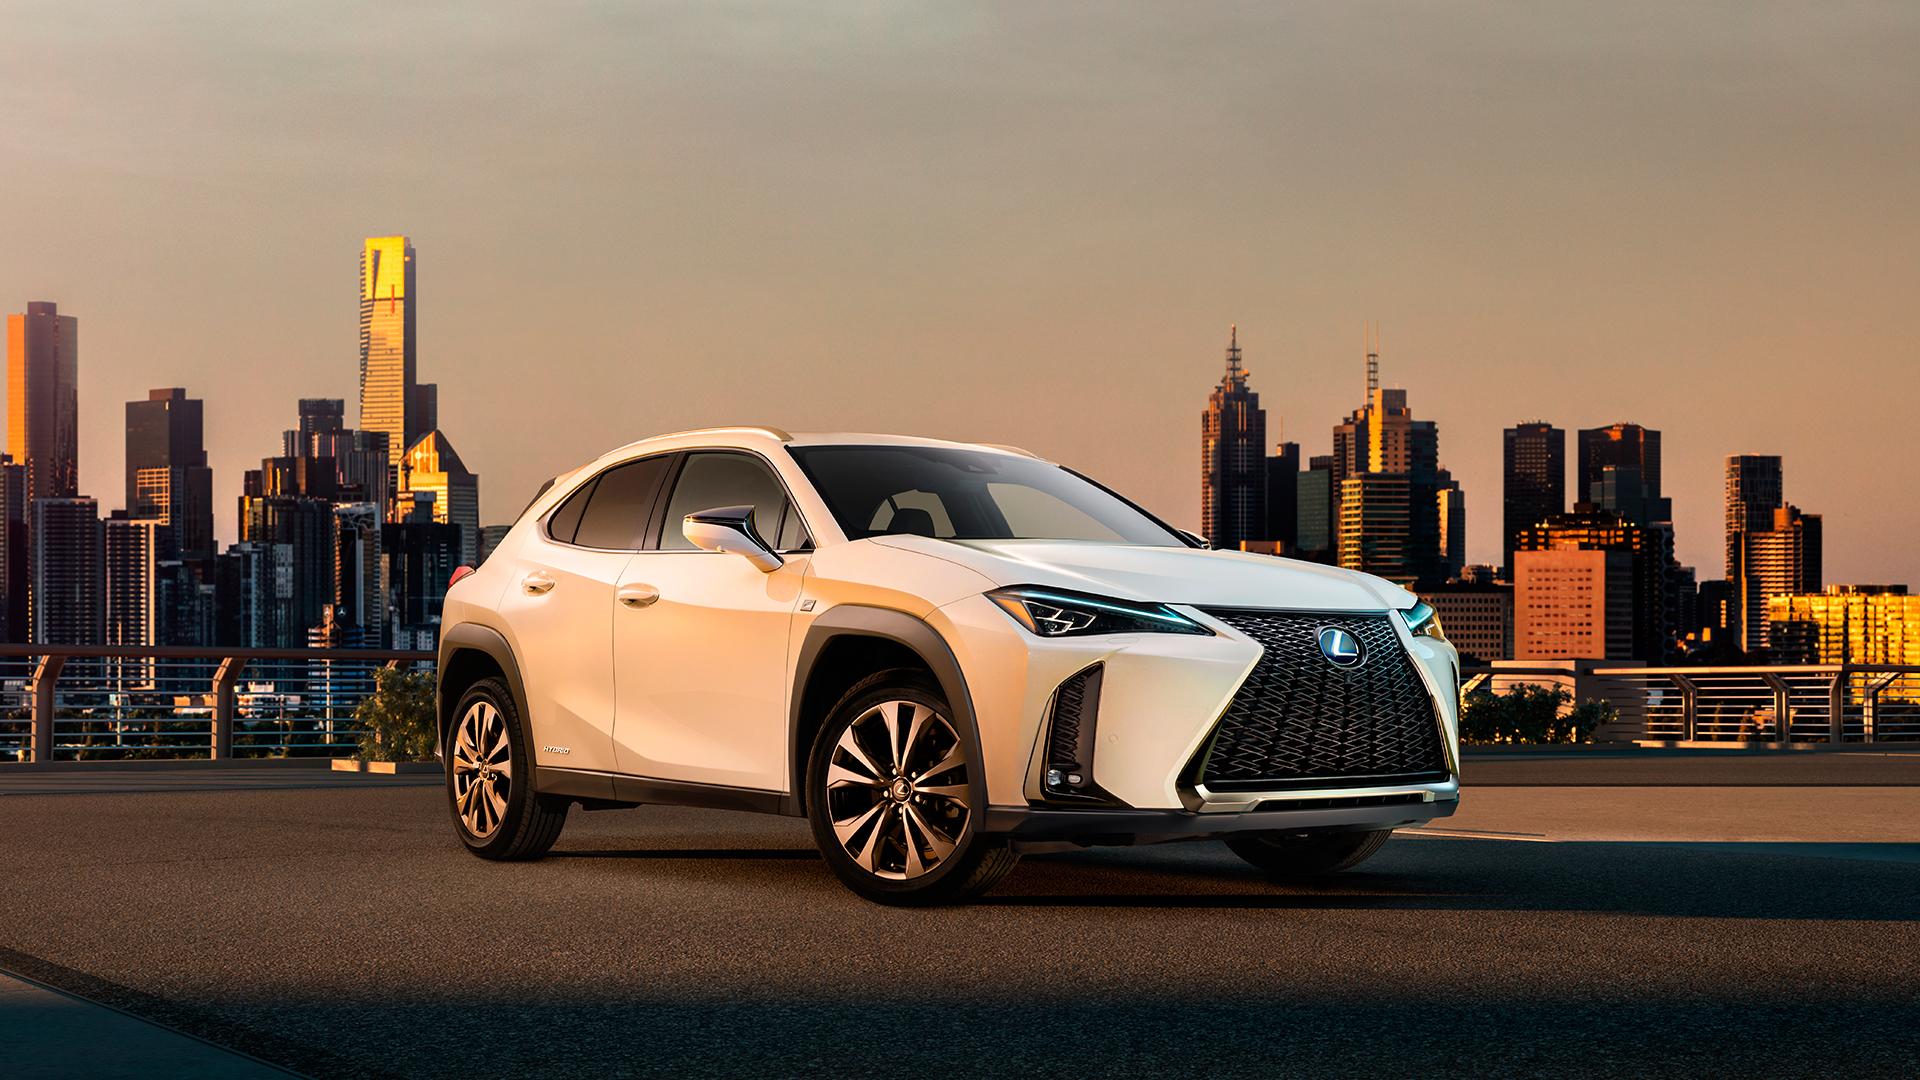 Primera imagen oficial del Lexus UX hero asset